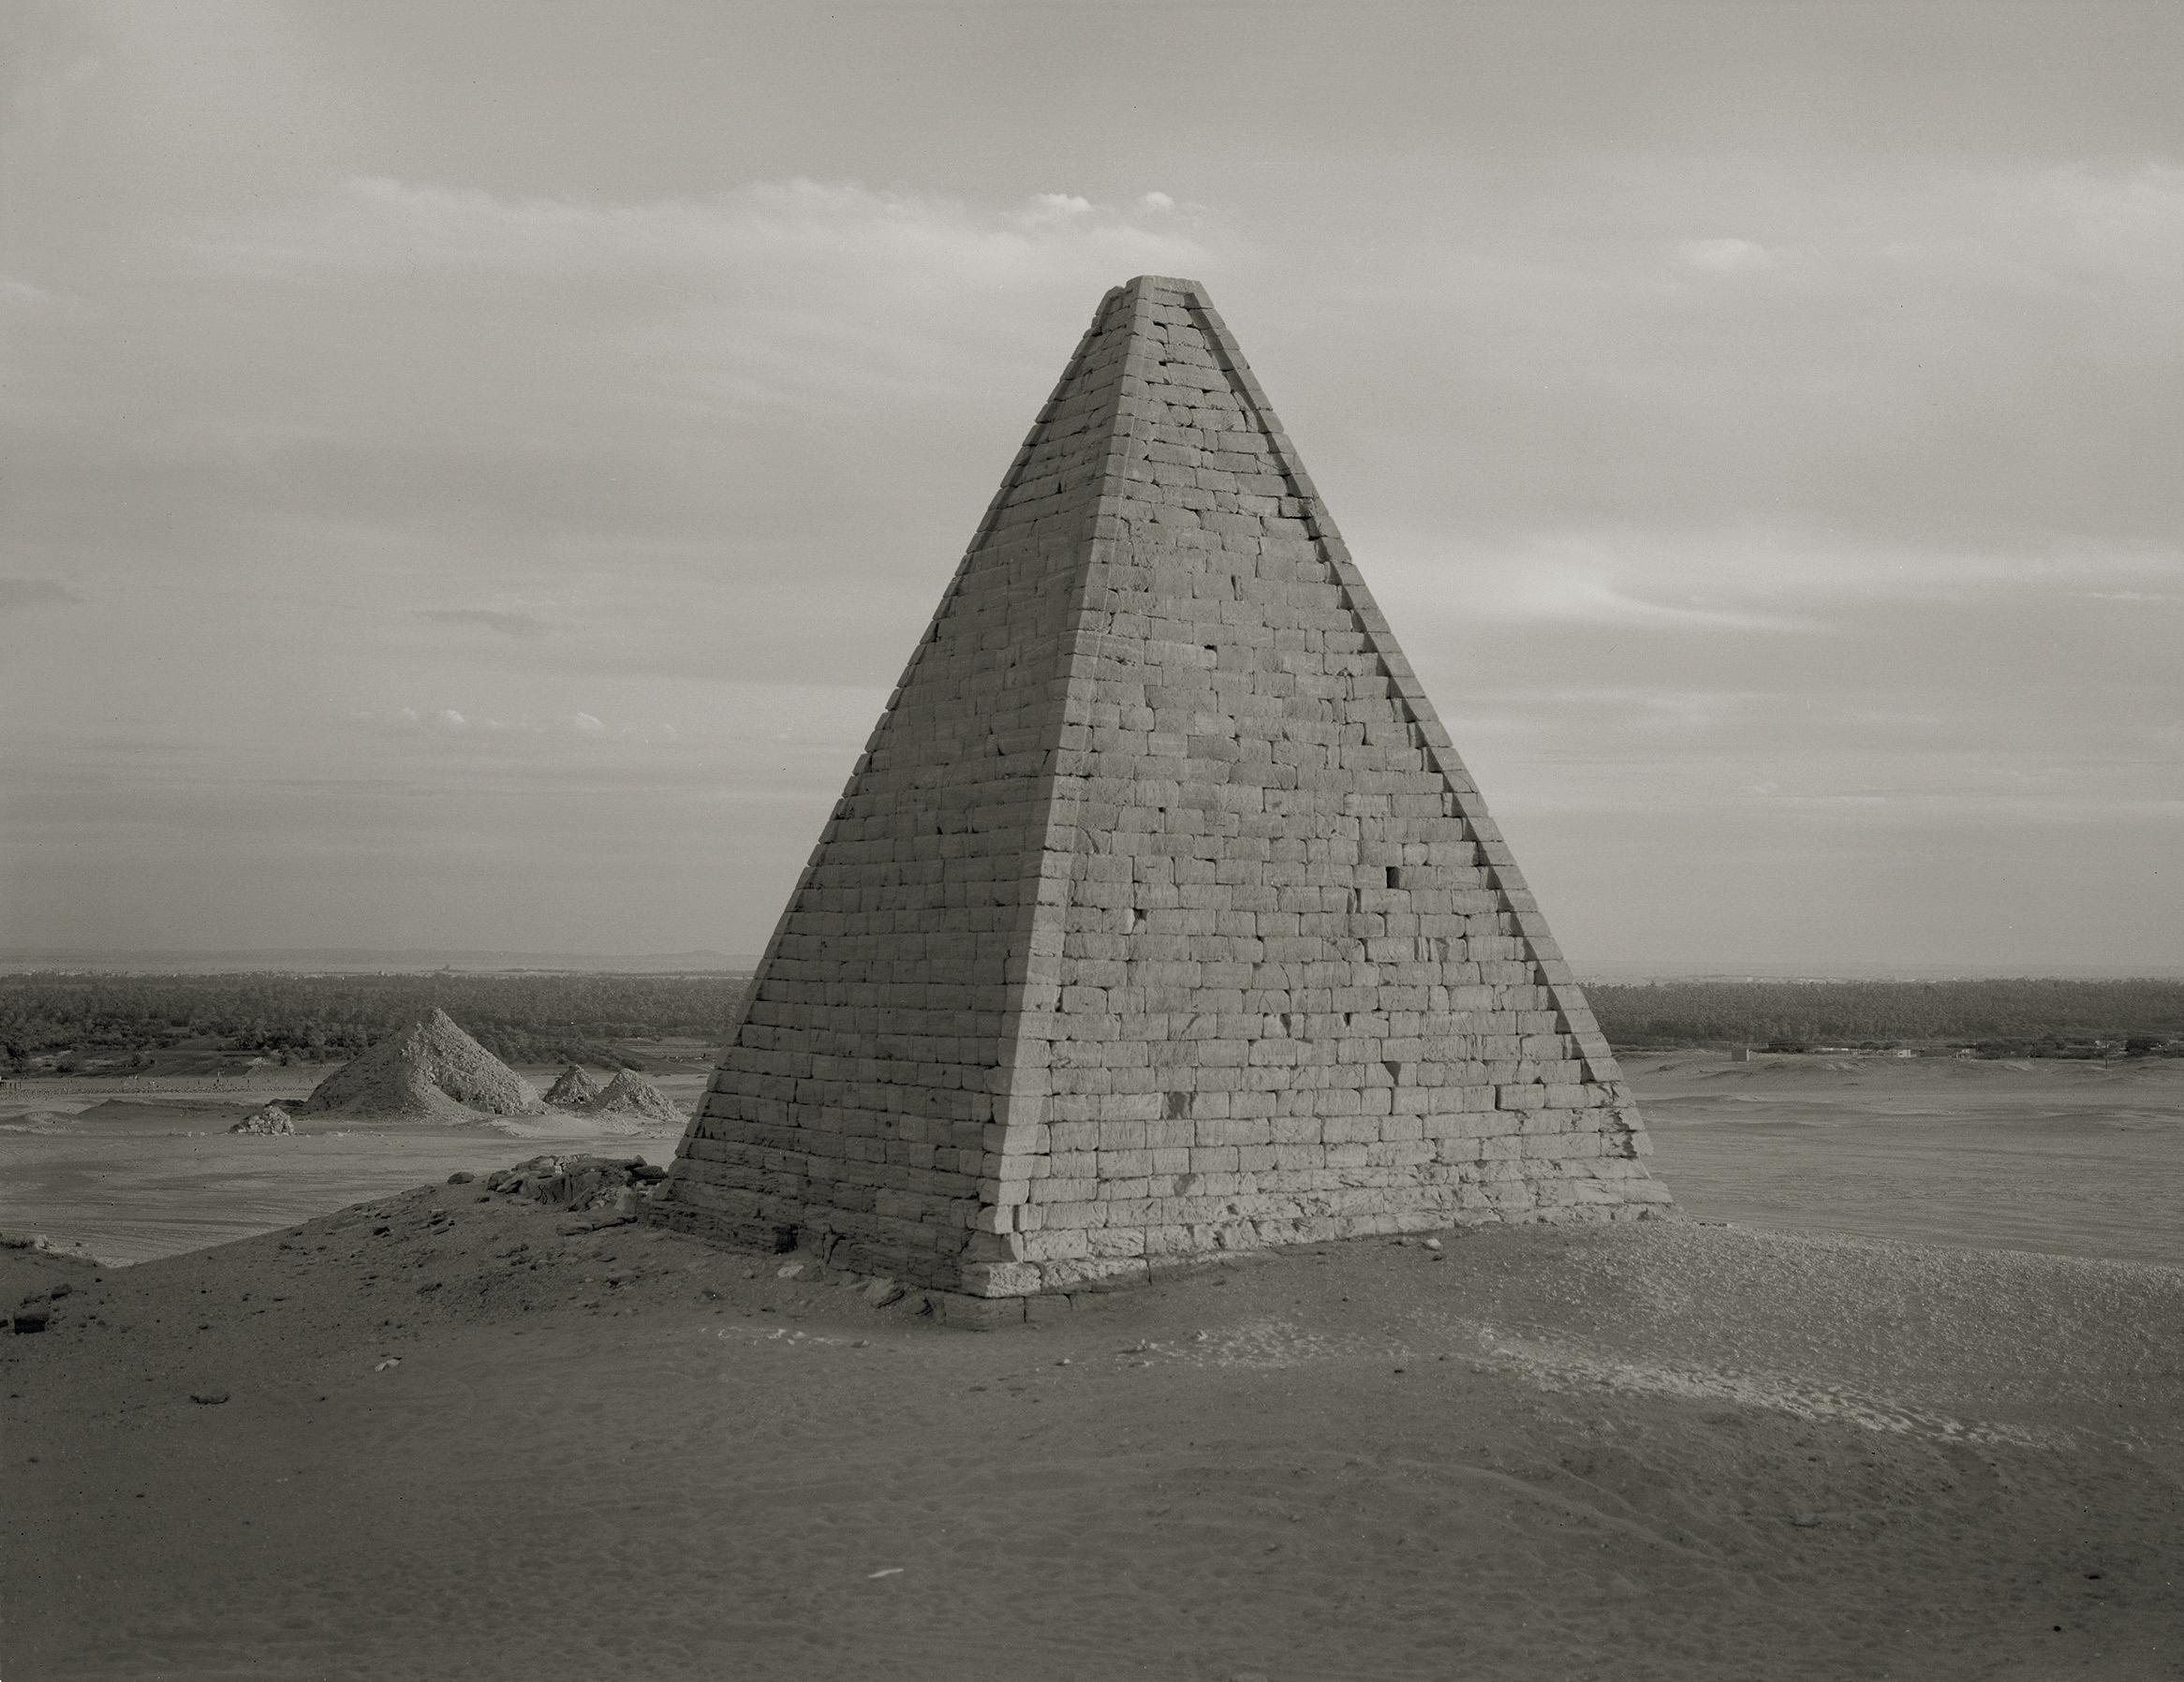 Claude Iverné, Pyramid, Meroitic Period, Jebel Barkal, Dar Cheiguir, Nubia, Jan. 2004